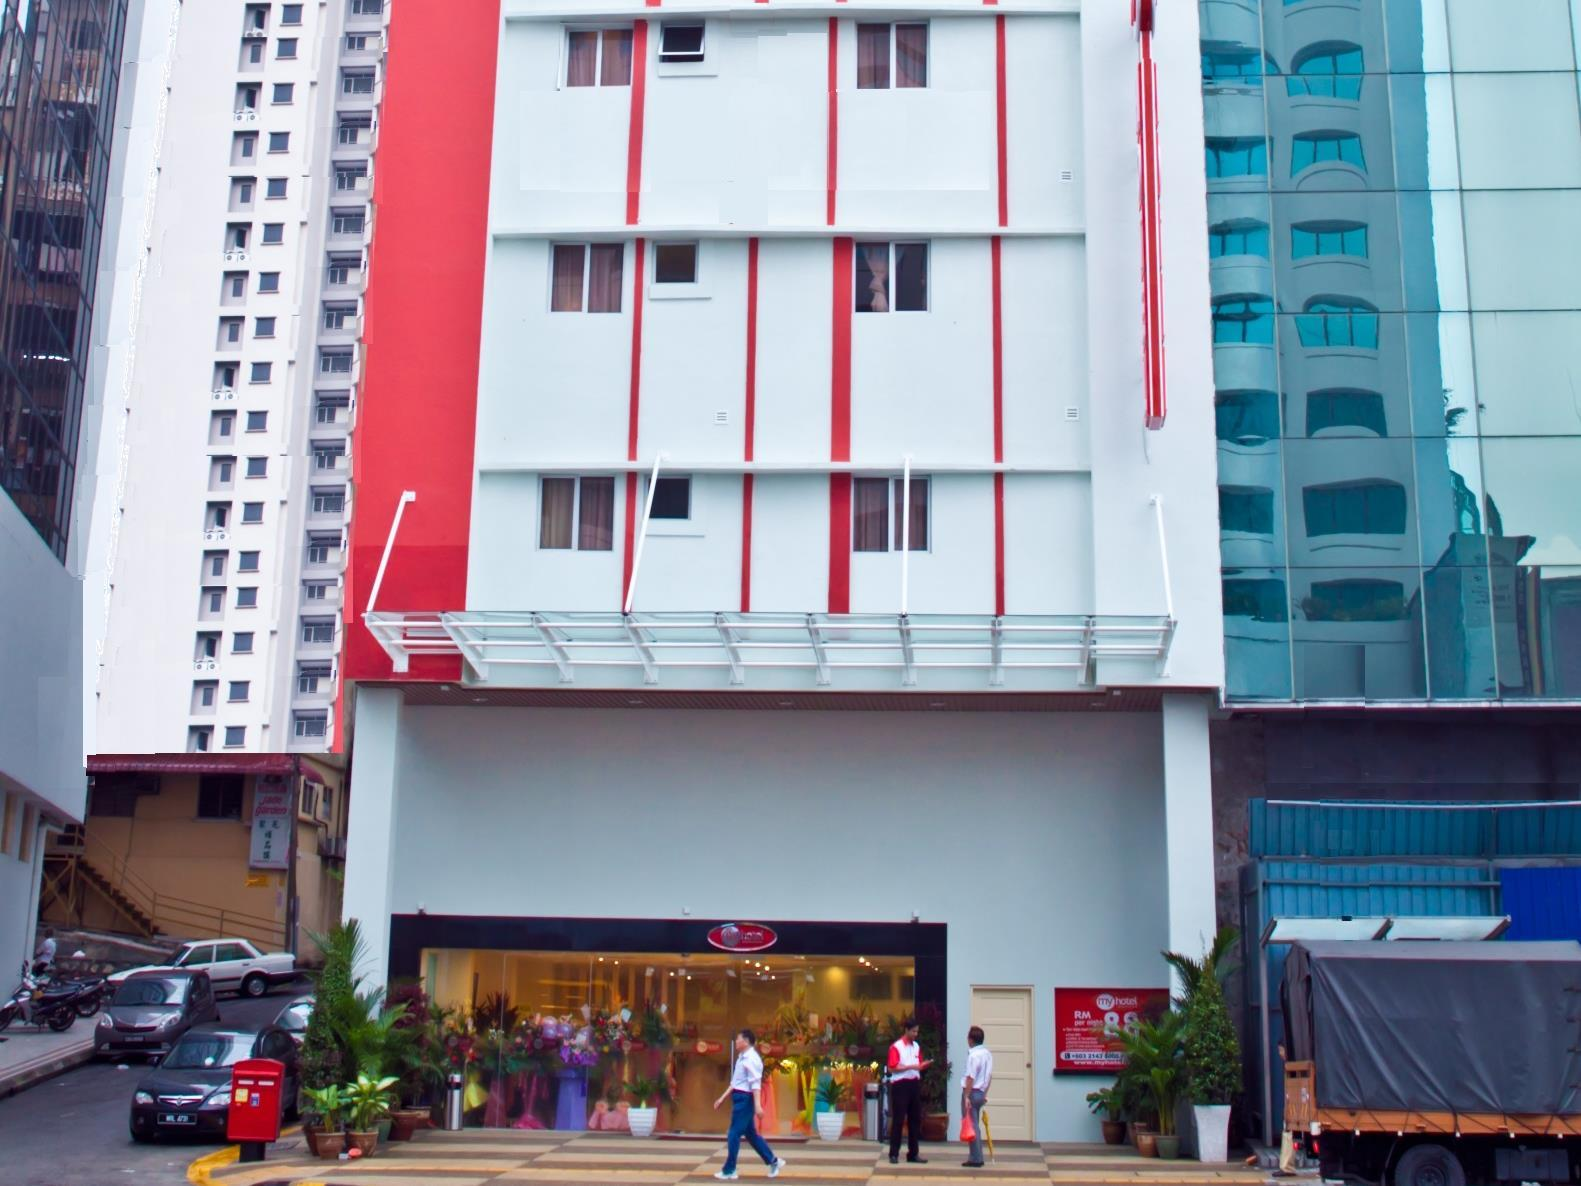 My Hotel @ Bukit Bintang - Hotels and Accommodation in Malaysia, Asia